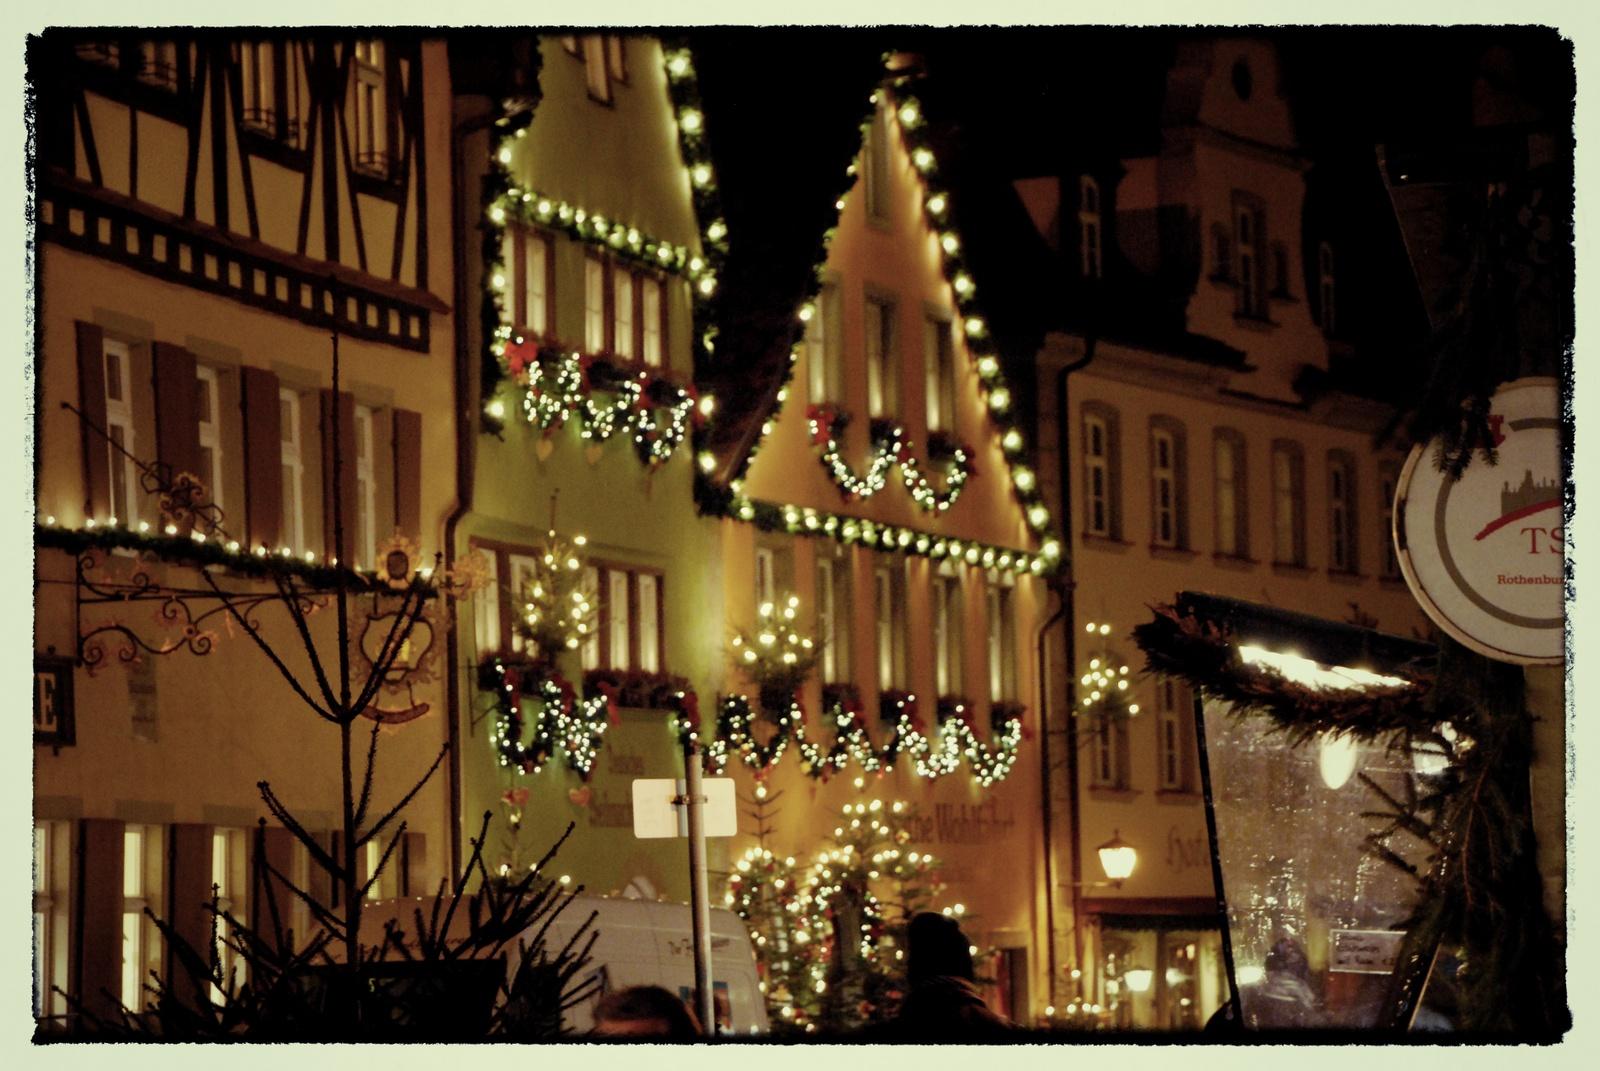 mercadillos navideños alemania europa